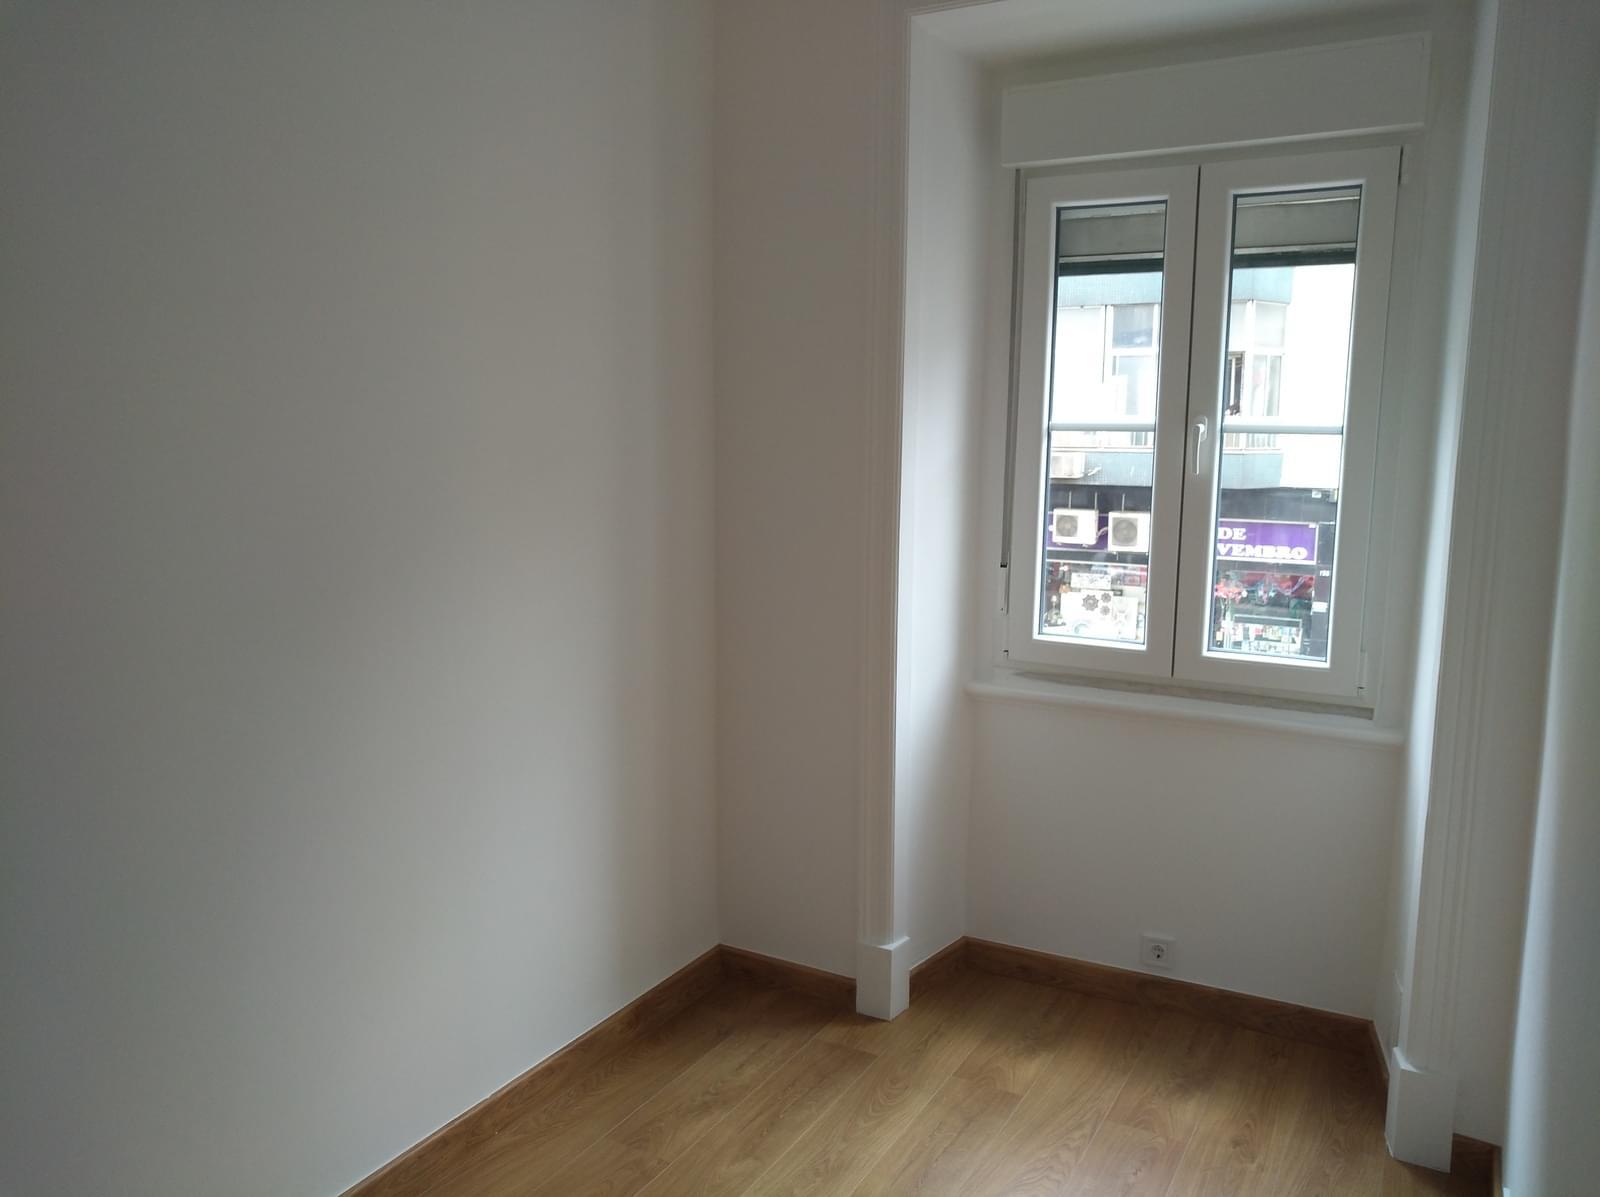 pf17316-apartamento-t2-lisboa-586a0765-457f-4889-a390-b95ac92c6e5e